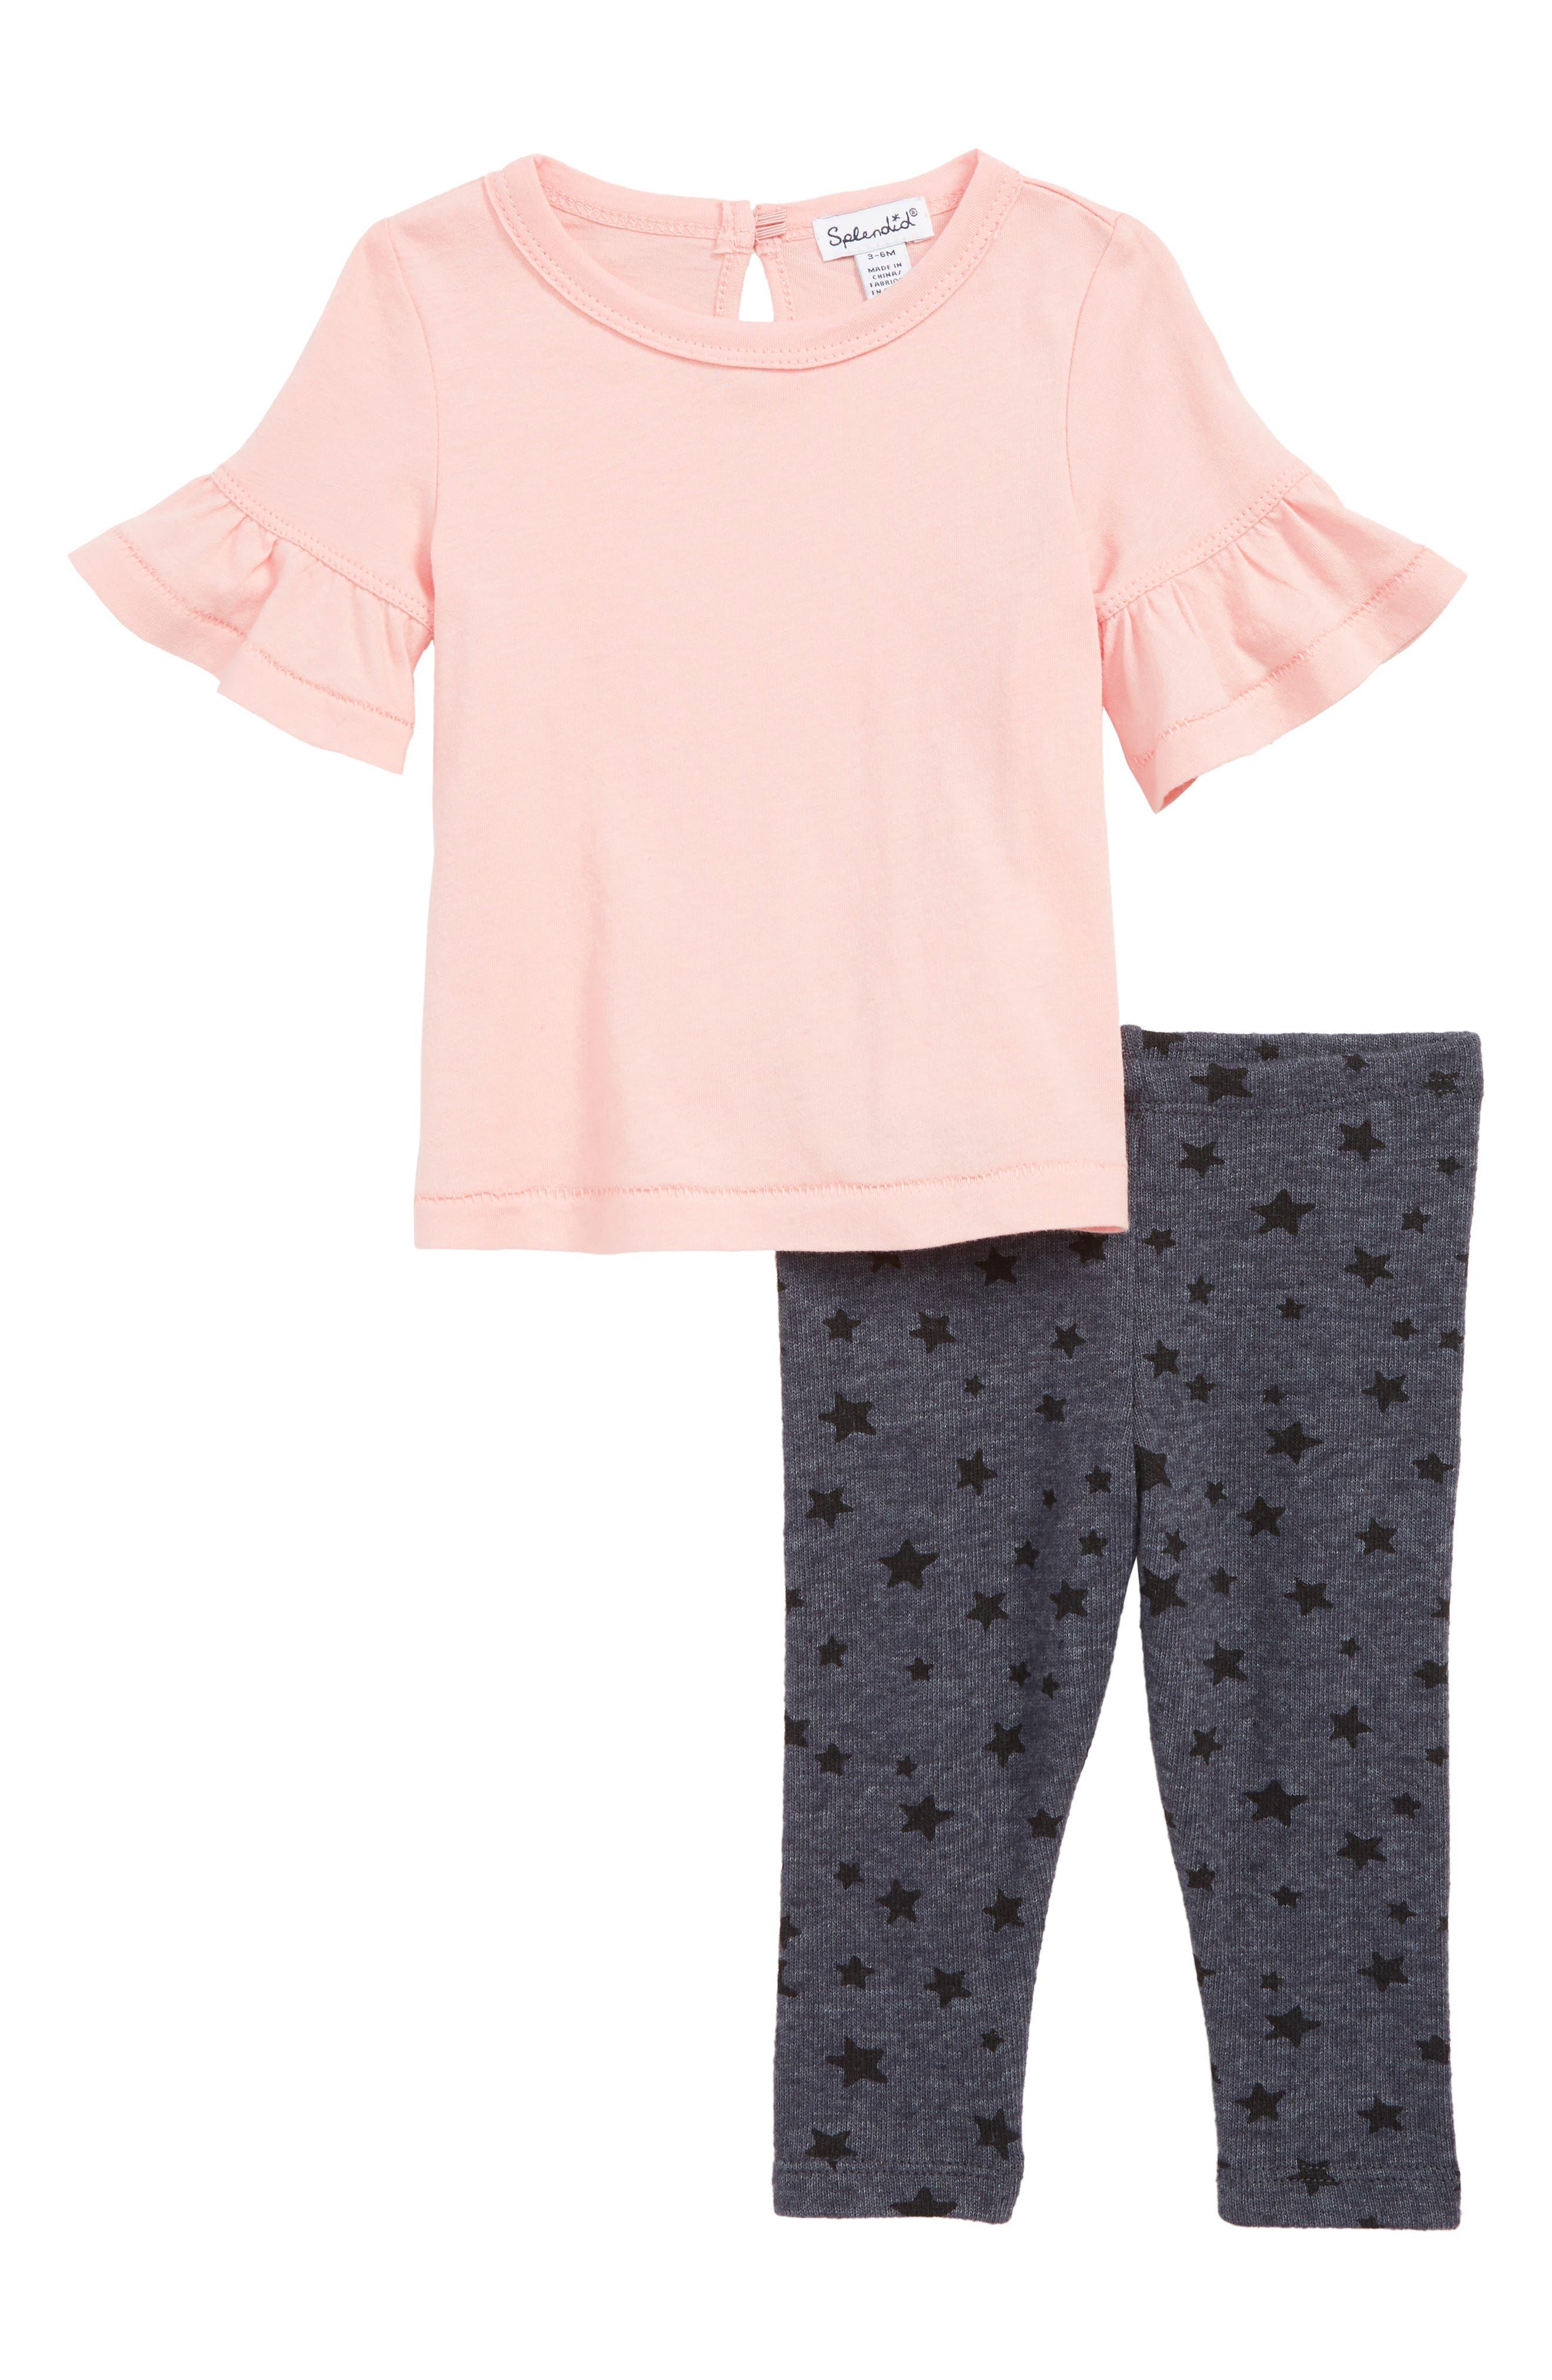 SPLENDID Ruffle T-Shirt & Star Leggings Set, Main, color, ANTIQUE PINK BEIGE